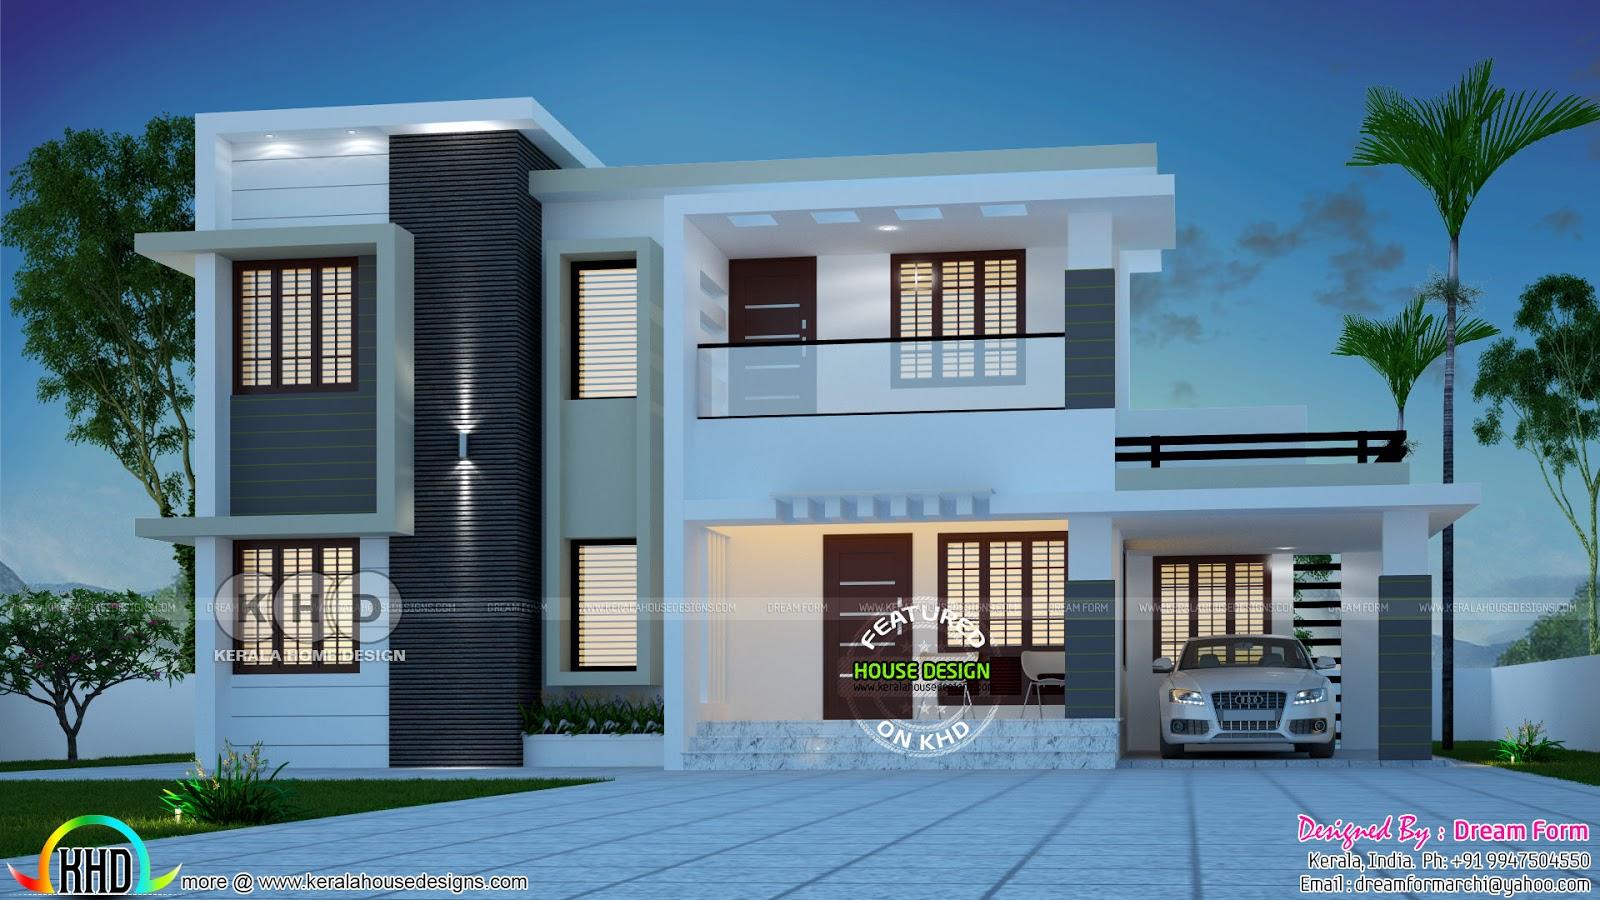 1989 Square Feet 4 Bedroom Flat Roof Contemporary House Plan Kerala Home Design Bloglovin